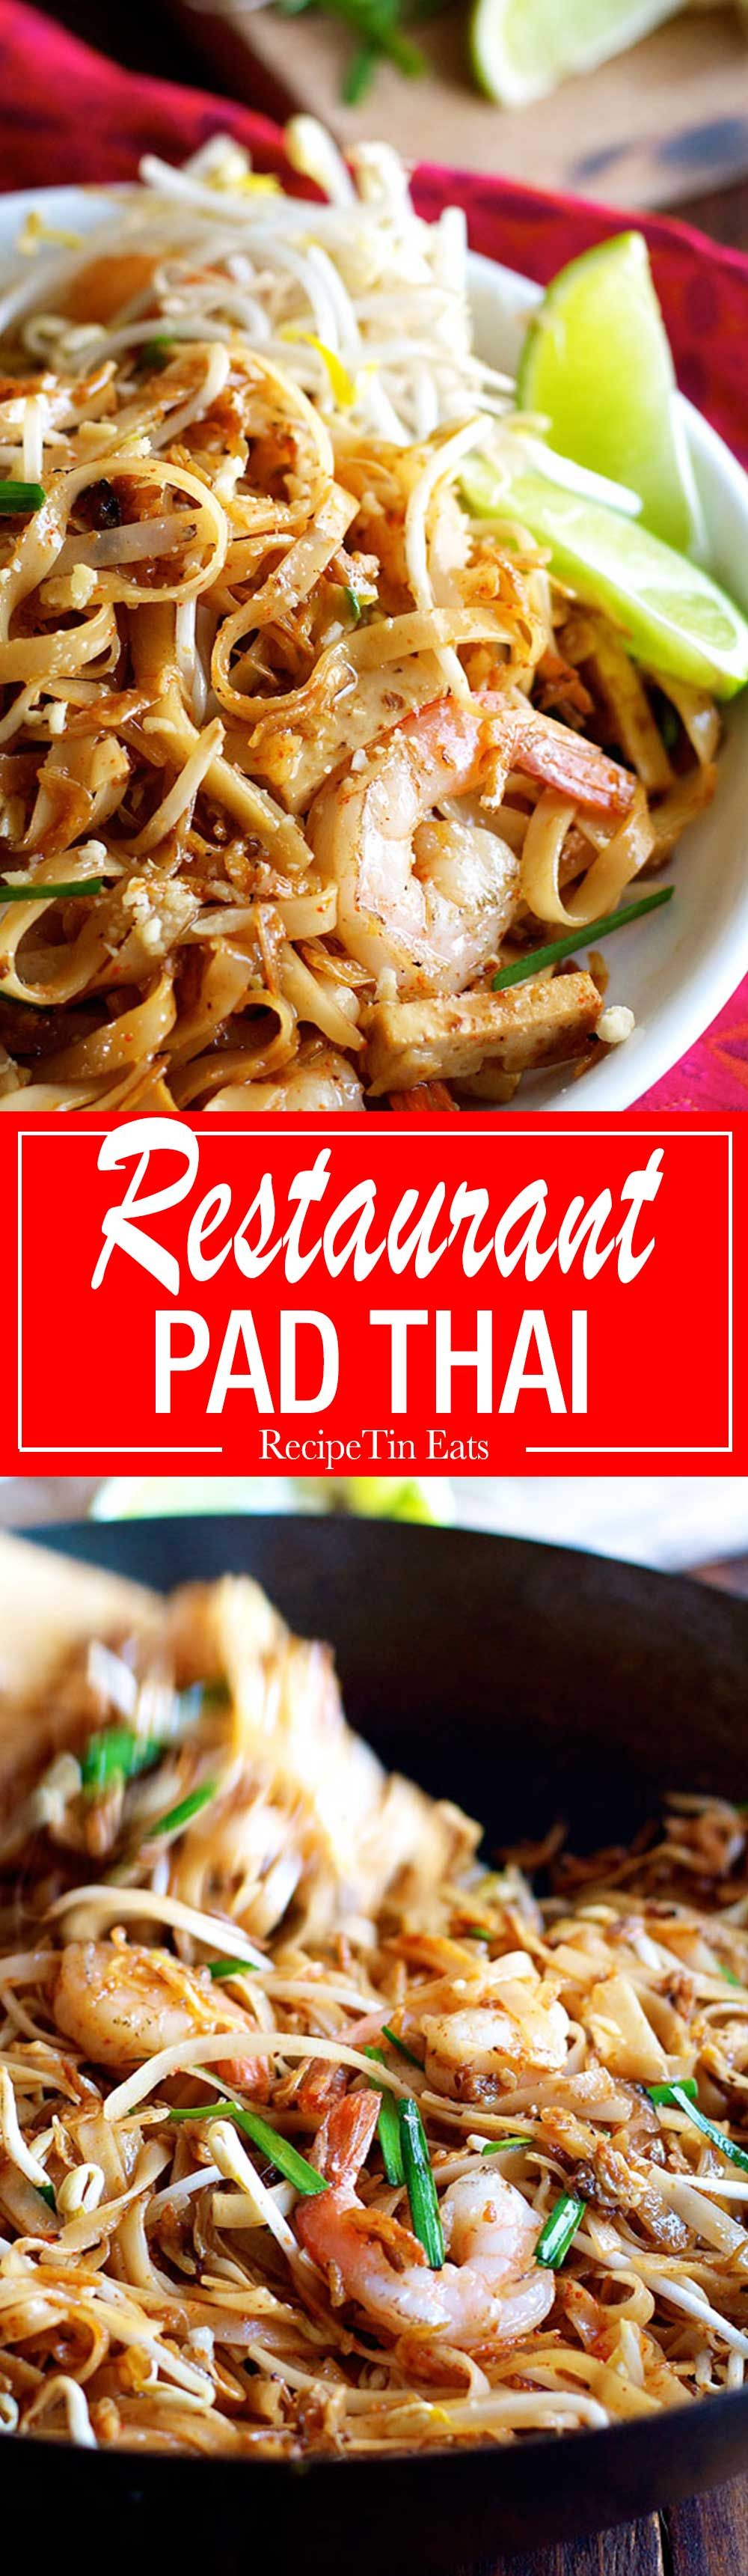 Shrimp Prawn Pad Thai Spice I Am Restaurant Recipe Food